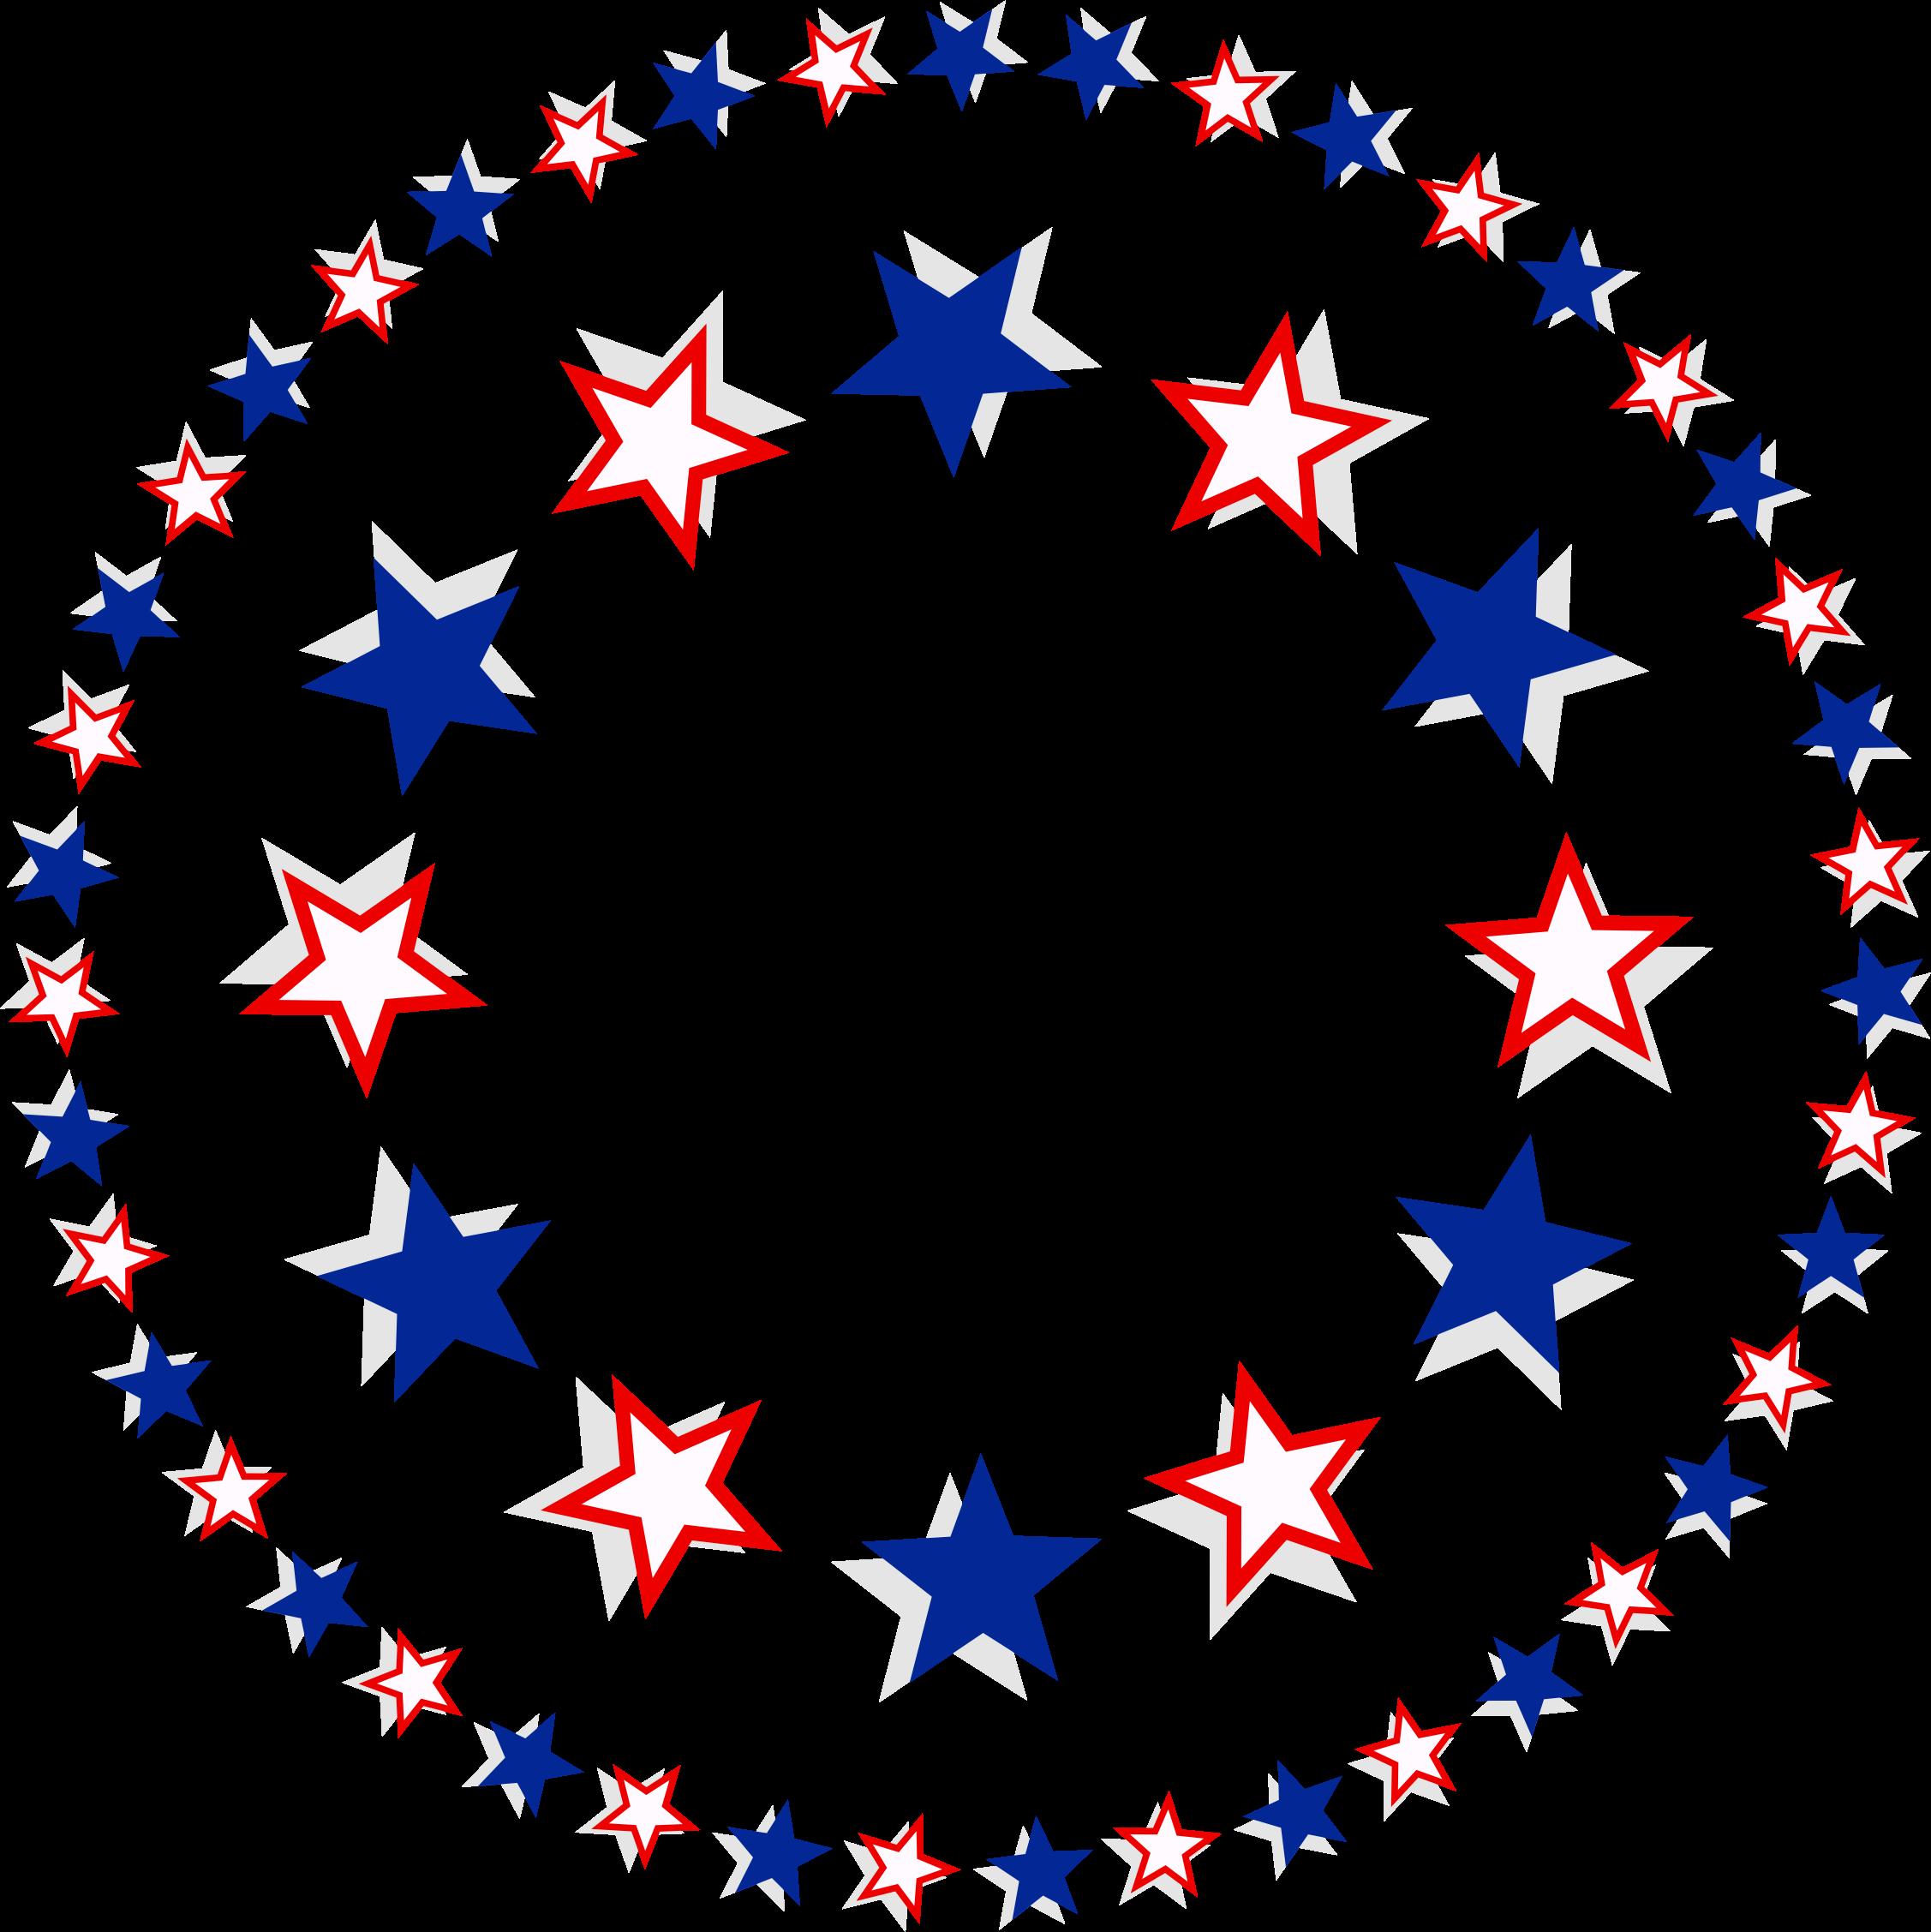 2254x2255 Free Patriotic Clipart Free American Art Clipartix